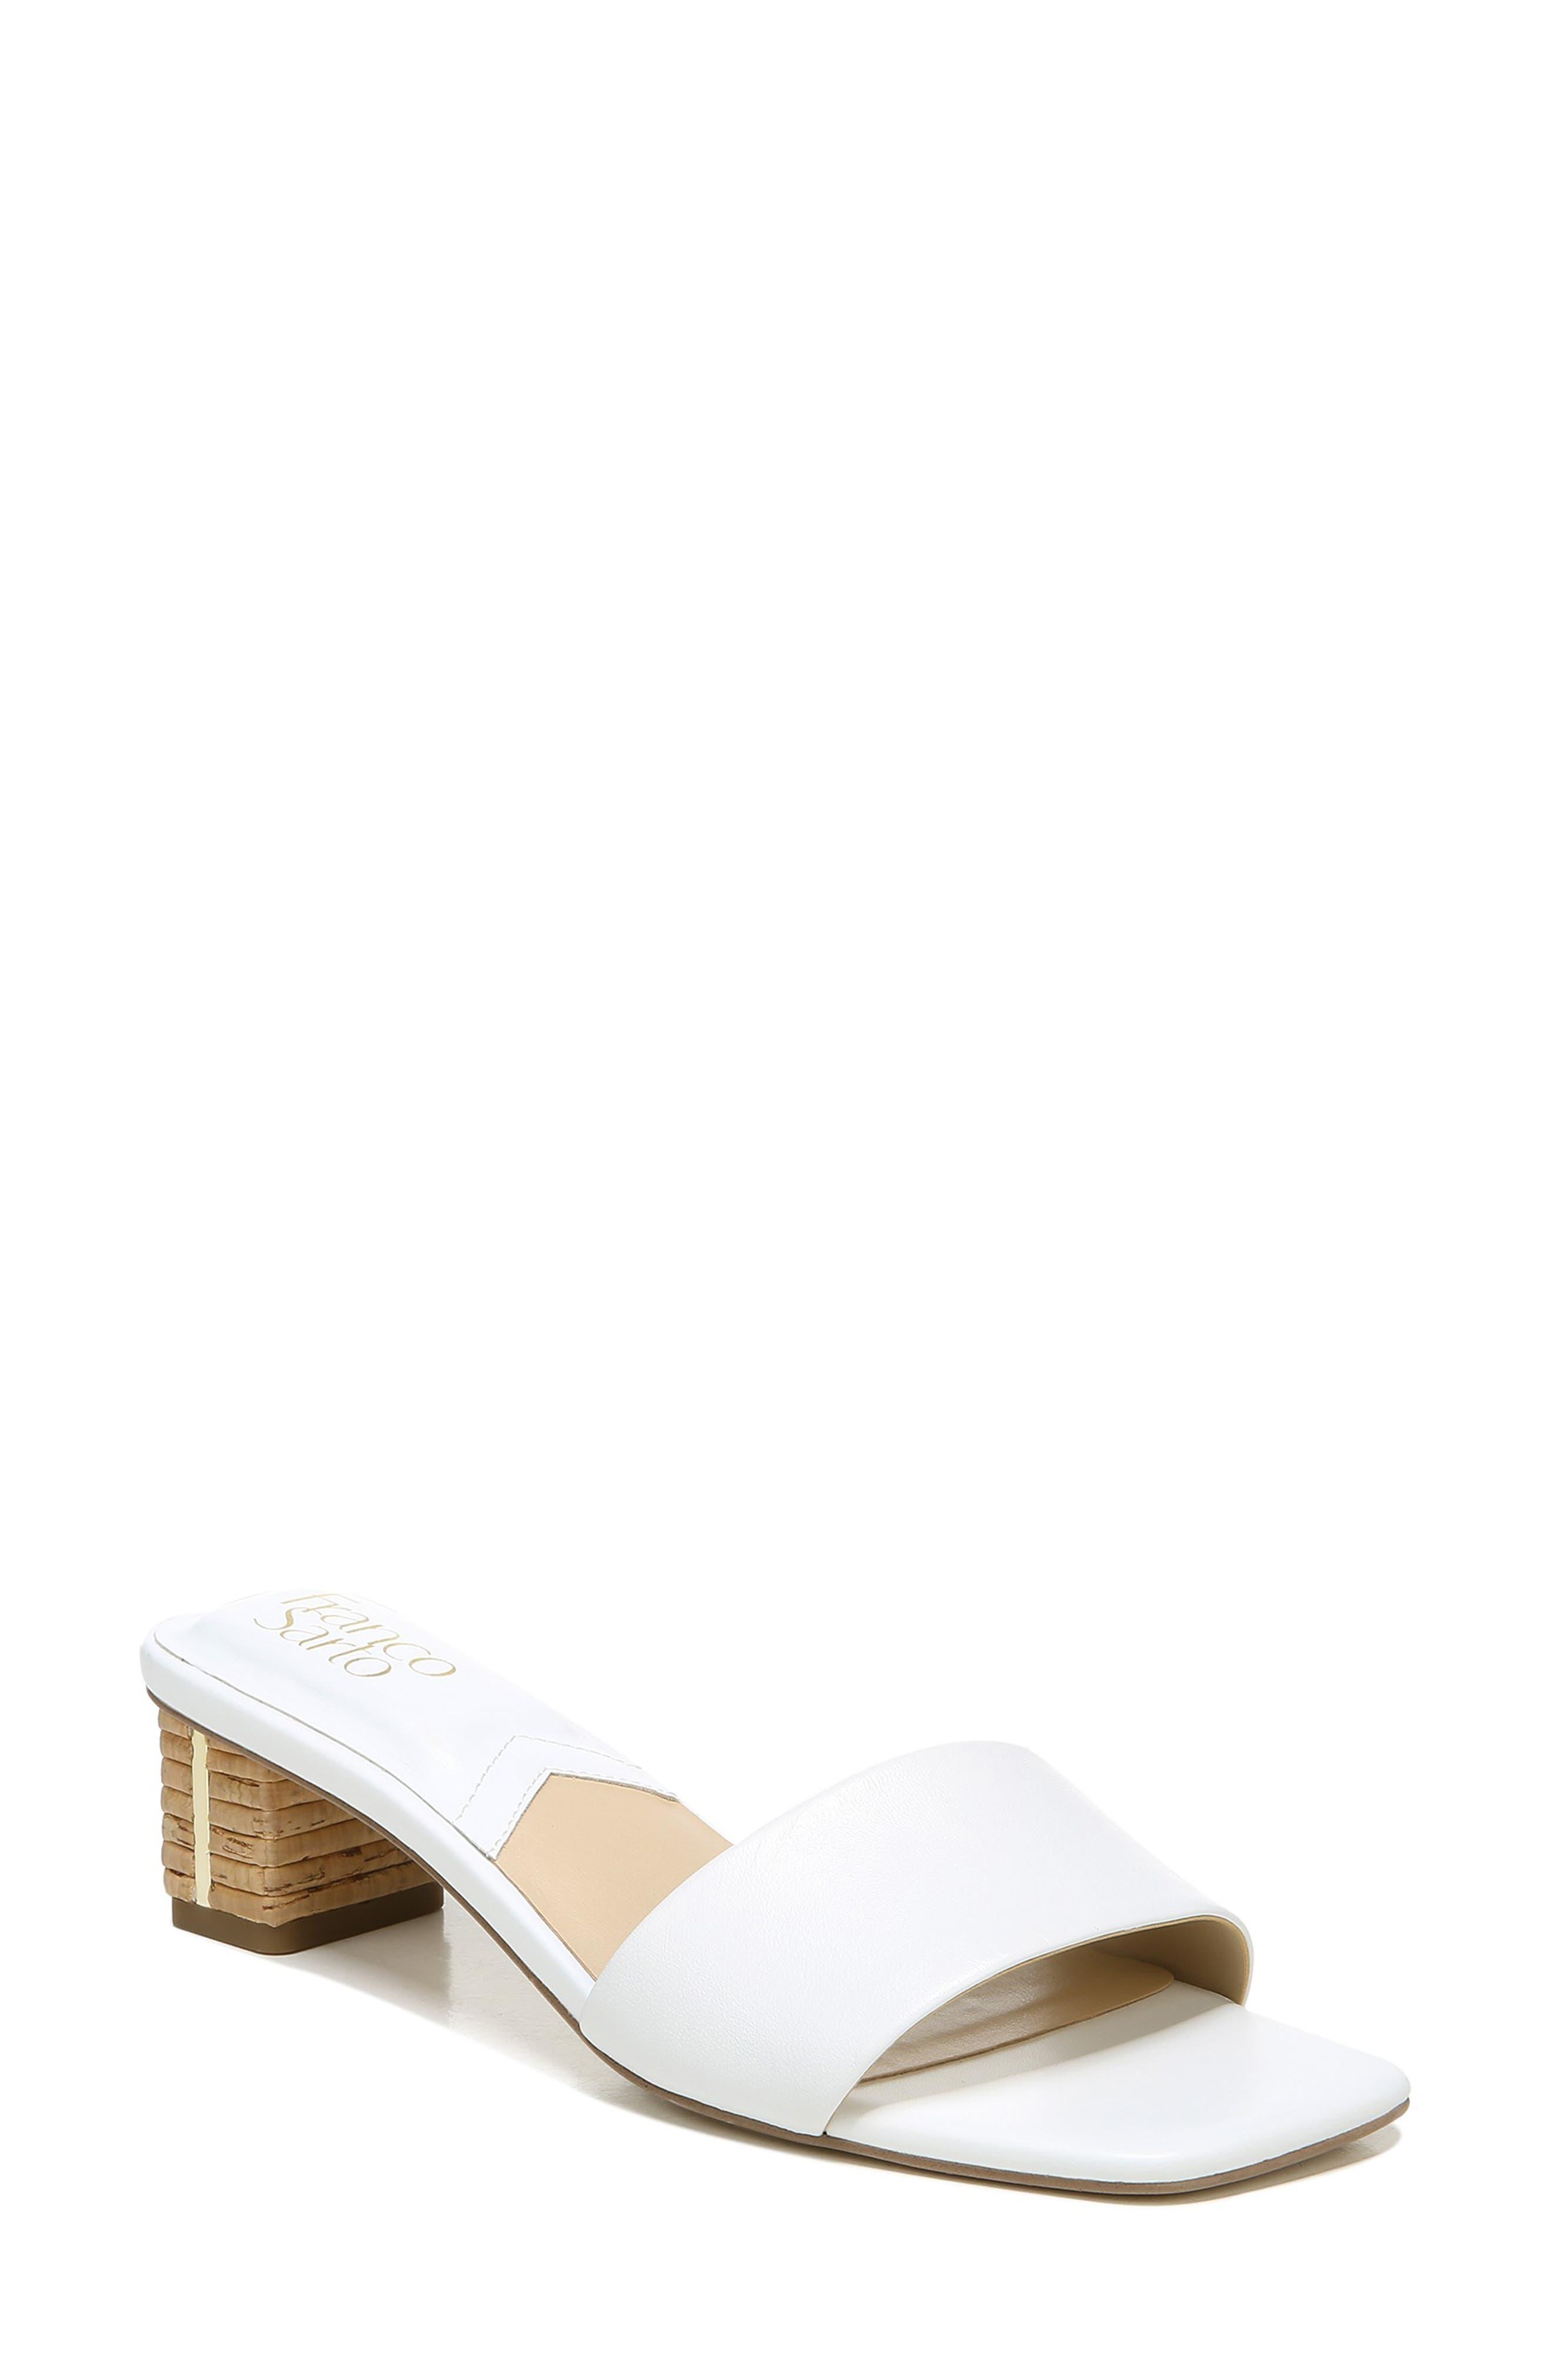 Cruella Slide Sandal